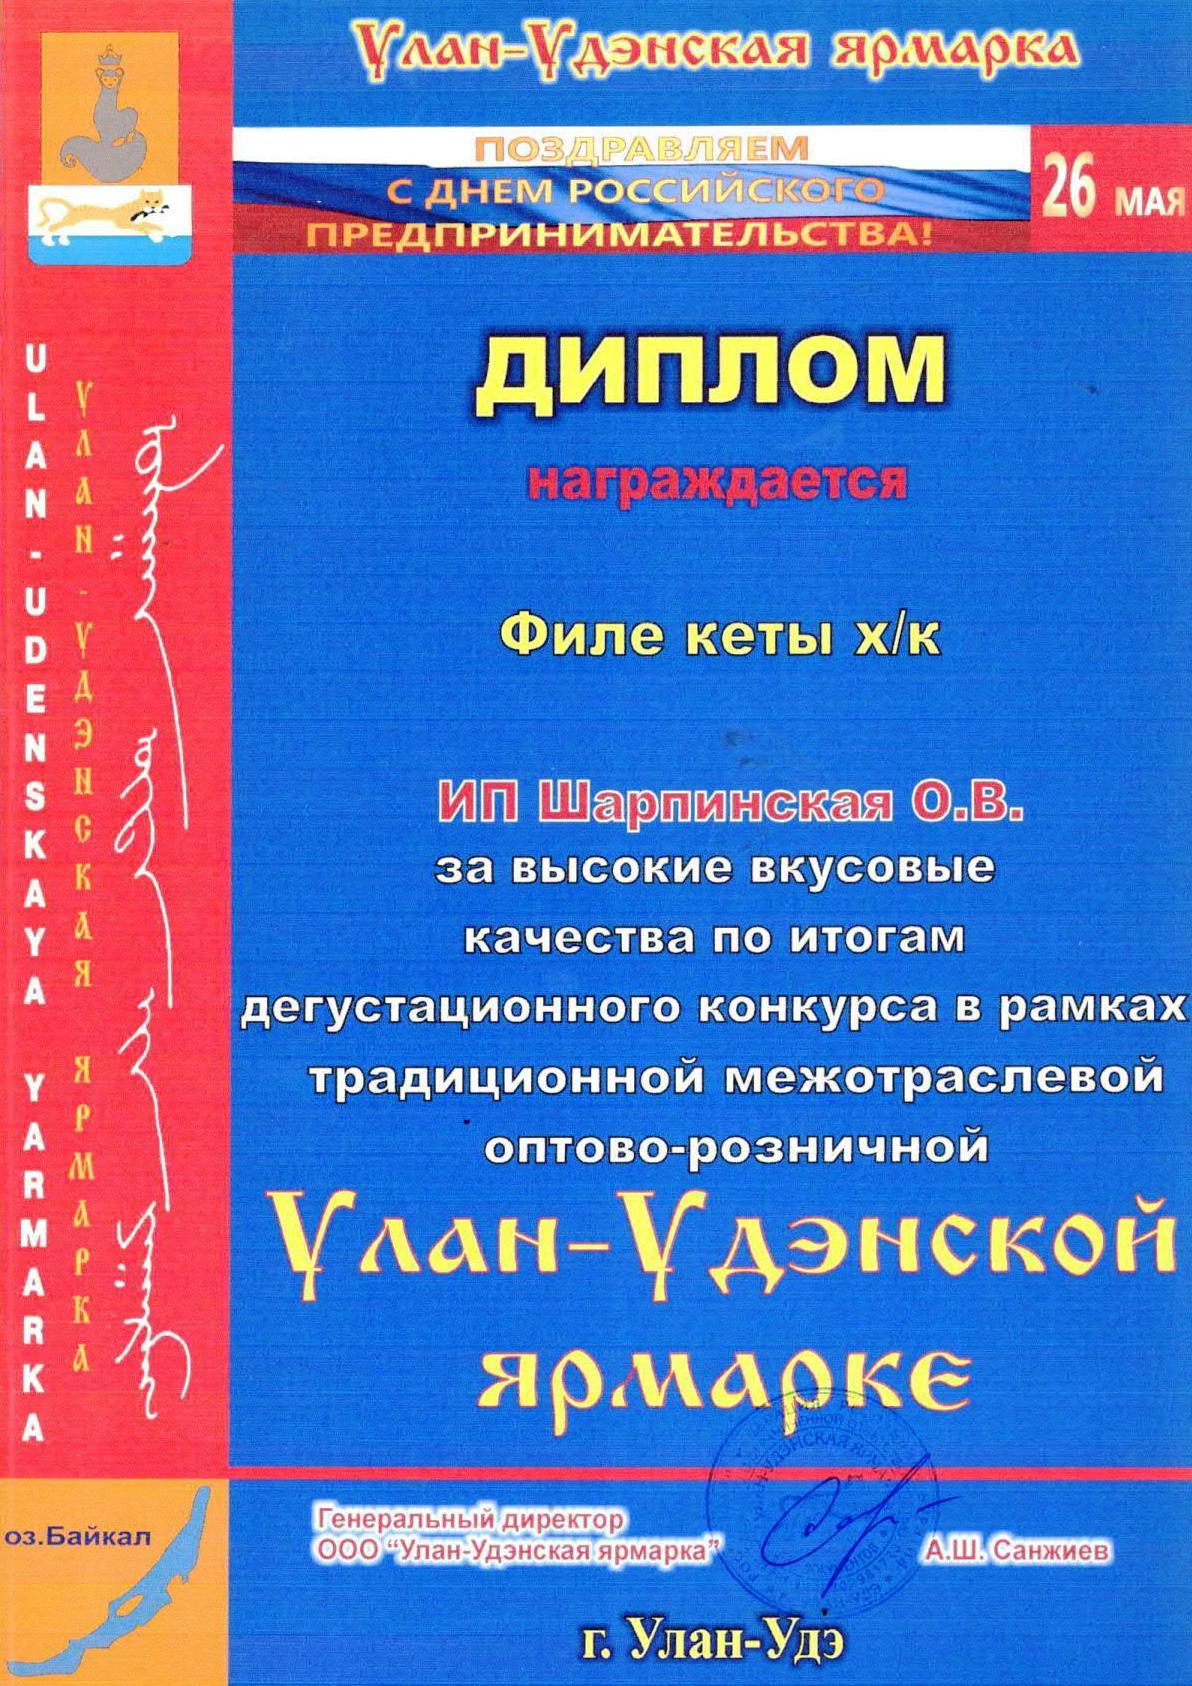 УУ 2014(2) 1